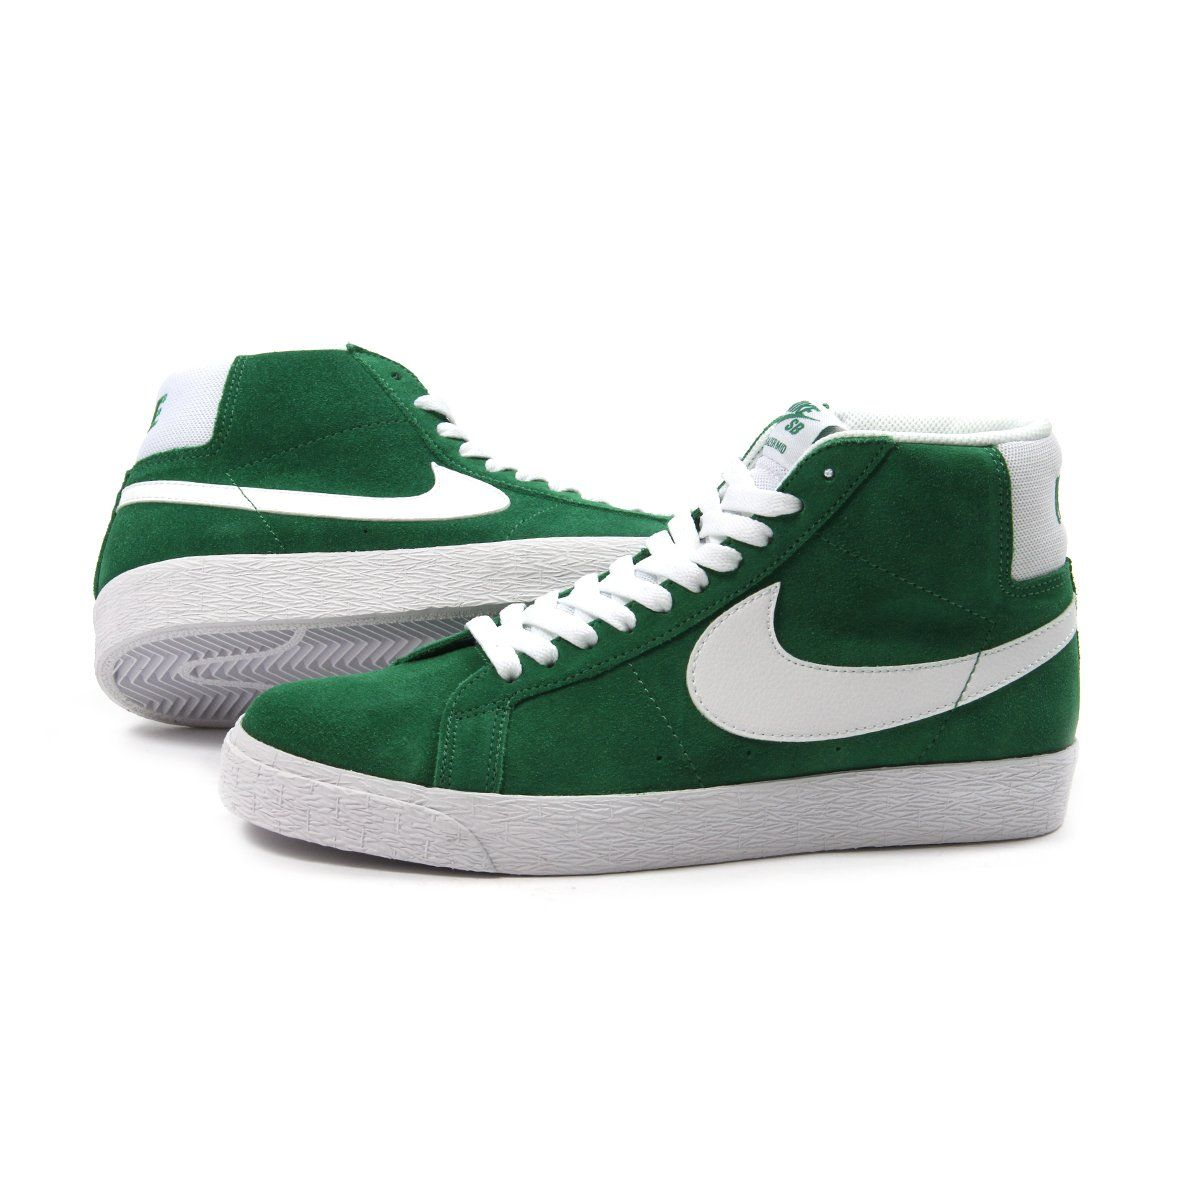 a7104035f800f9 Nike SB Zoom Blazer Mid (Pine Green White)